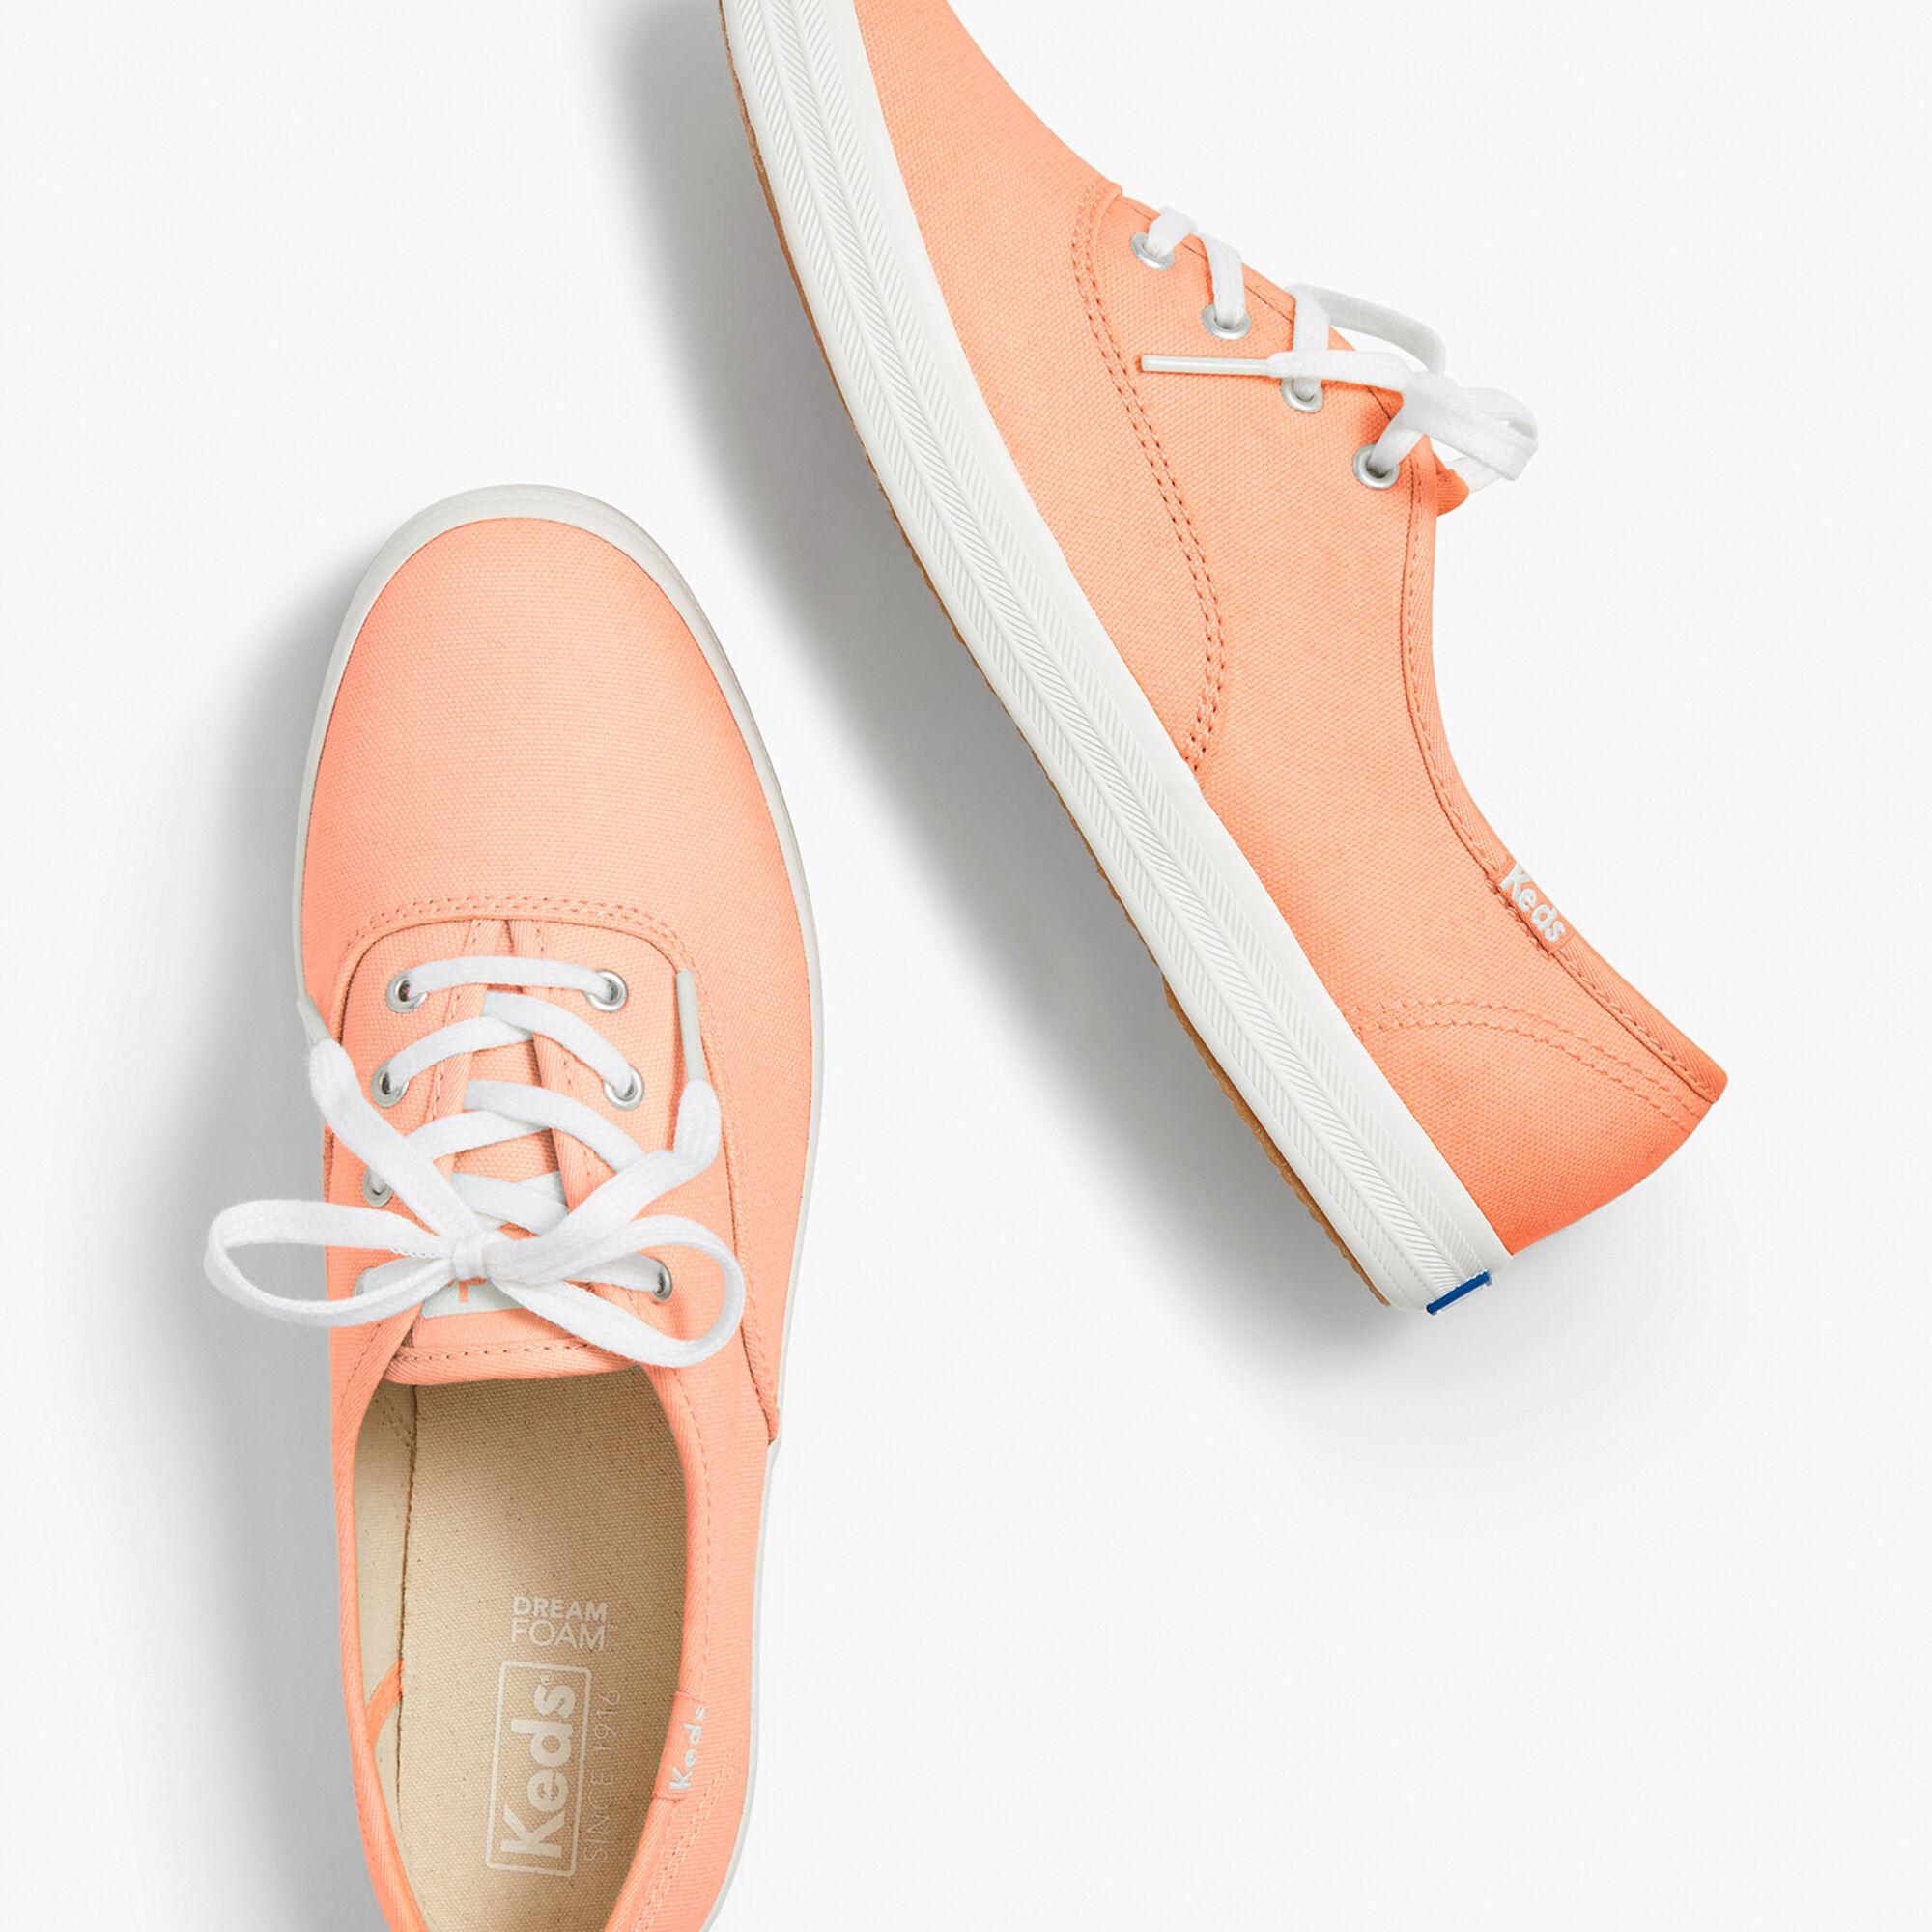 3662985134c Keds(TM) Champion Sneakers - Seasonal Solids